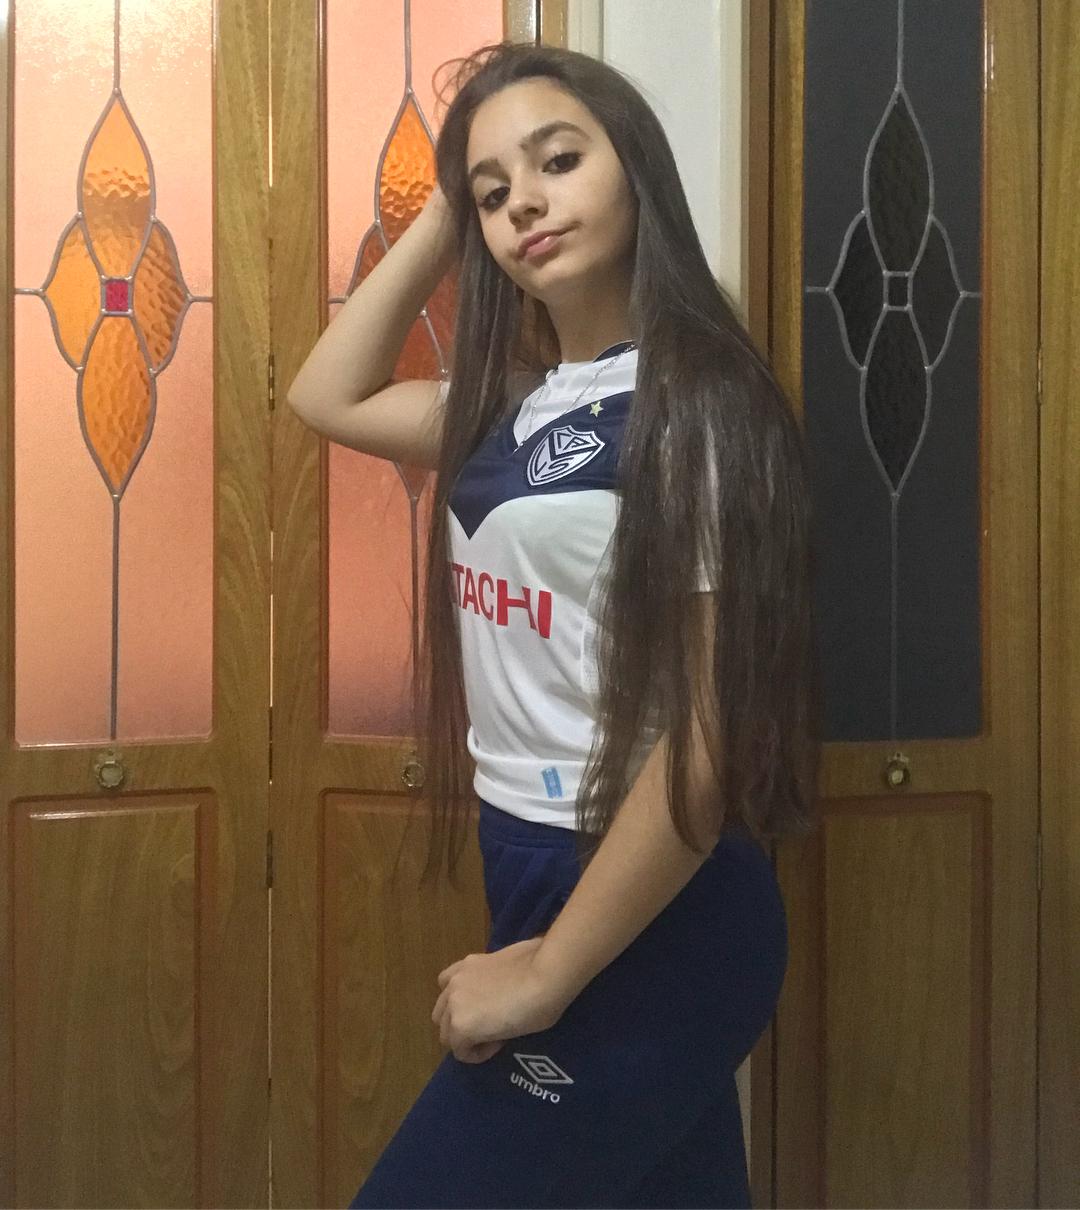 Camila-Nerea-Gonzalez-Wallpapers-Insta-Fit-Bio-16